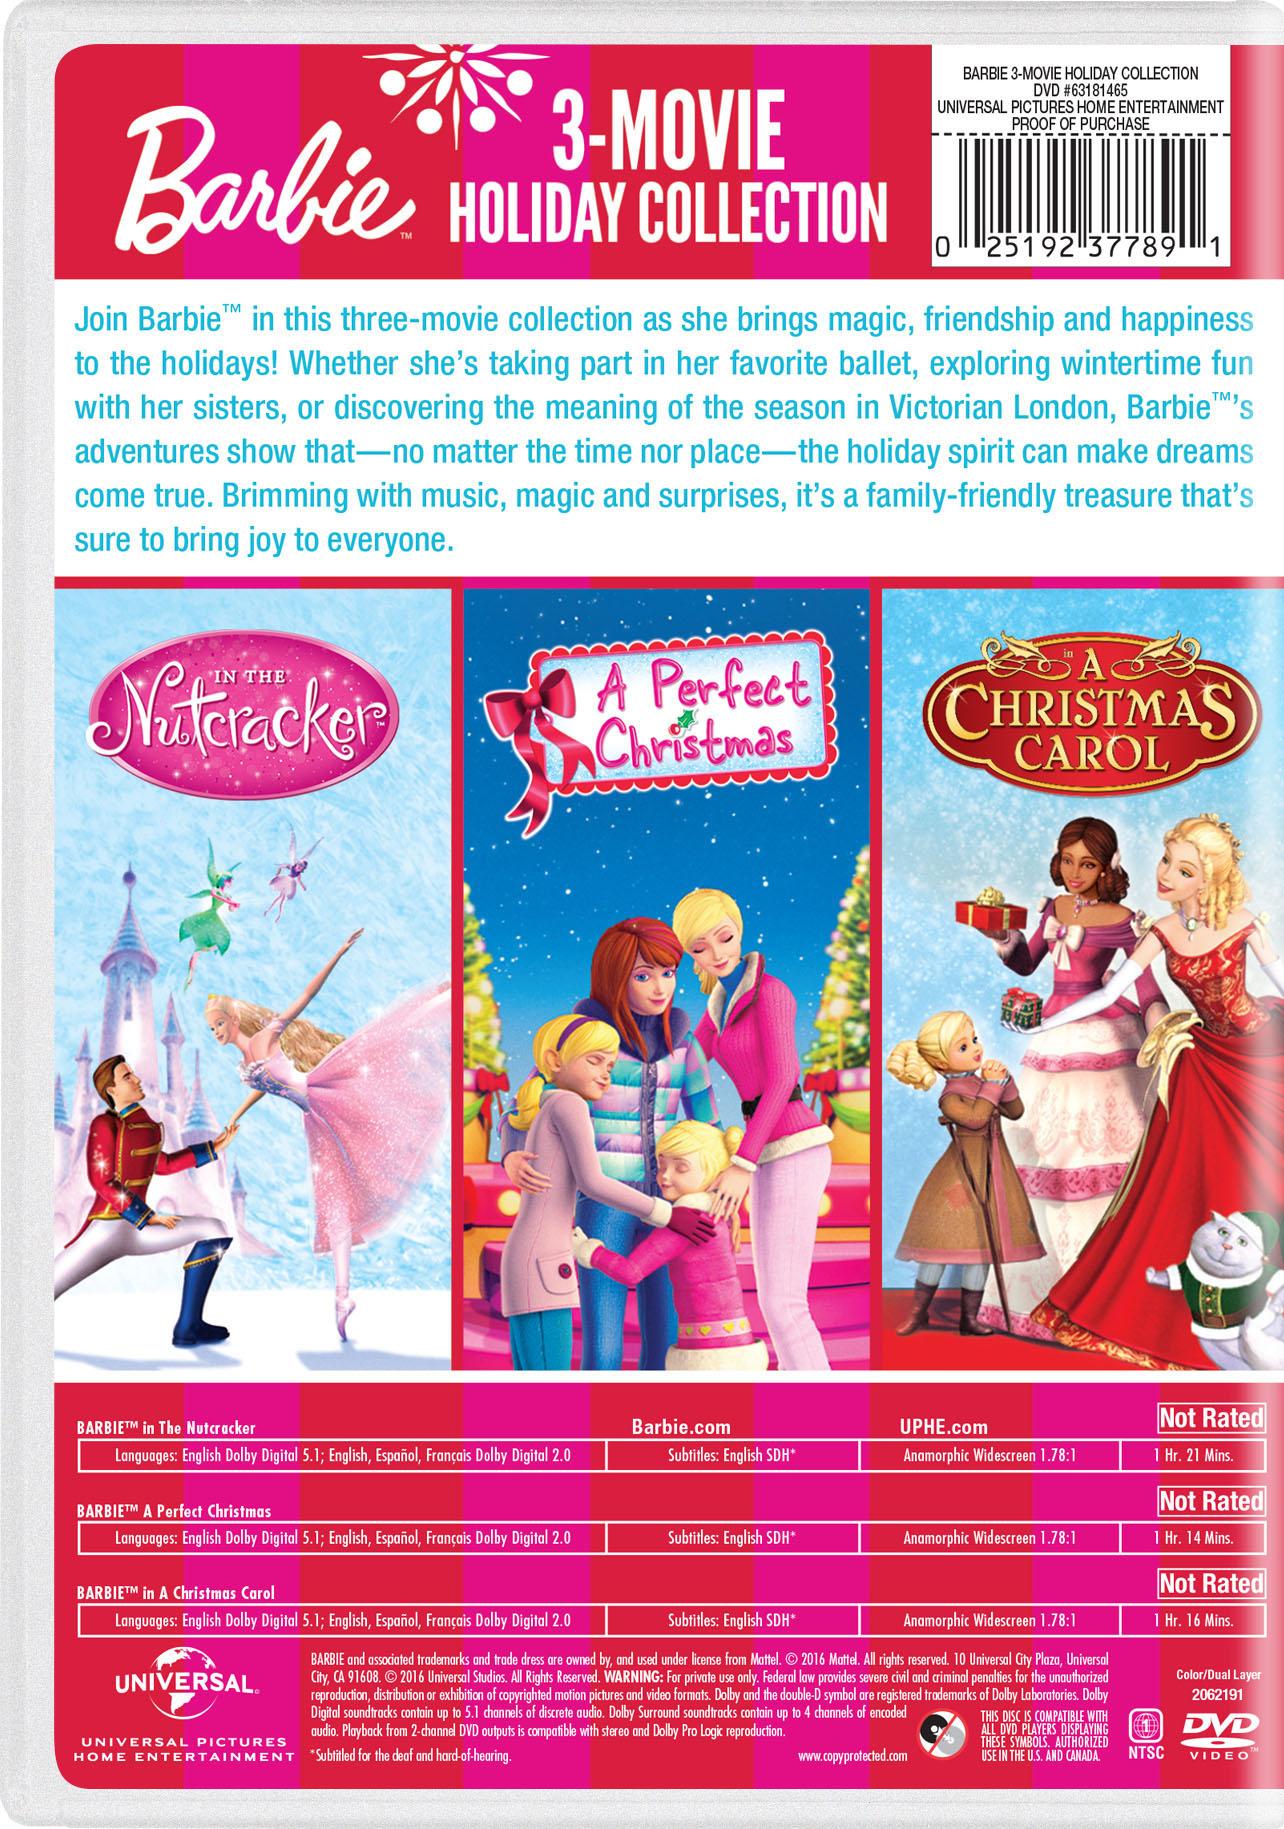 Barbie in The Nutcracker | Movie Page | DVD, Blu-ray, Digital HD, On Demand, Trailers, Downloads ...